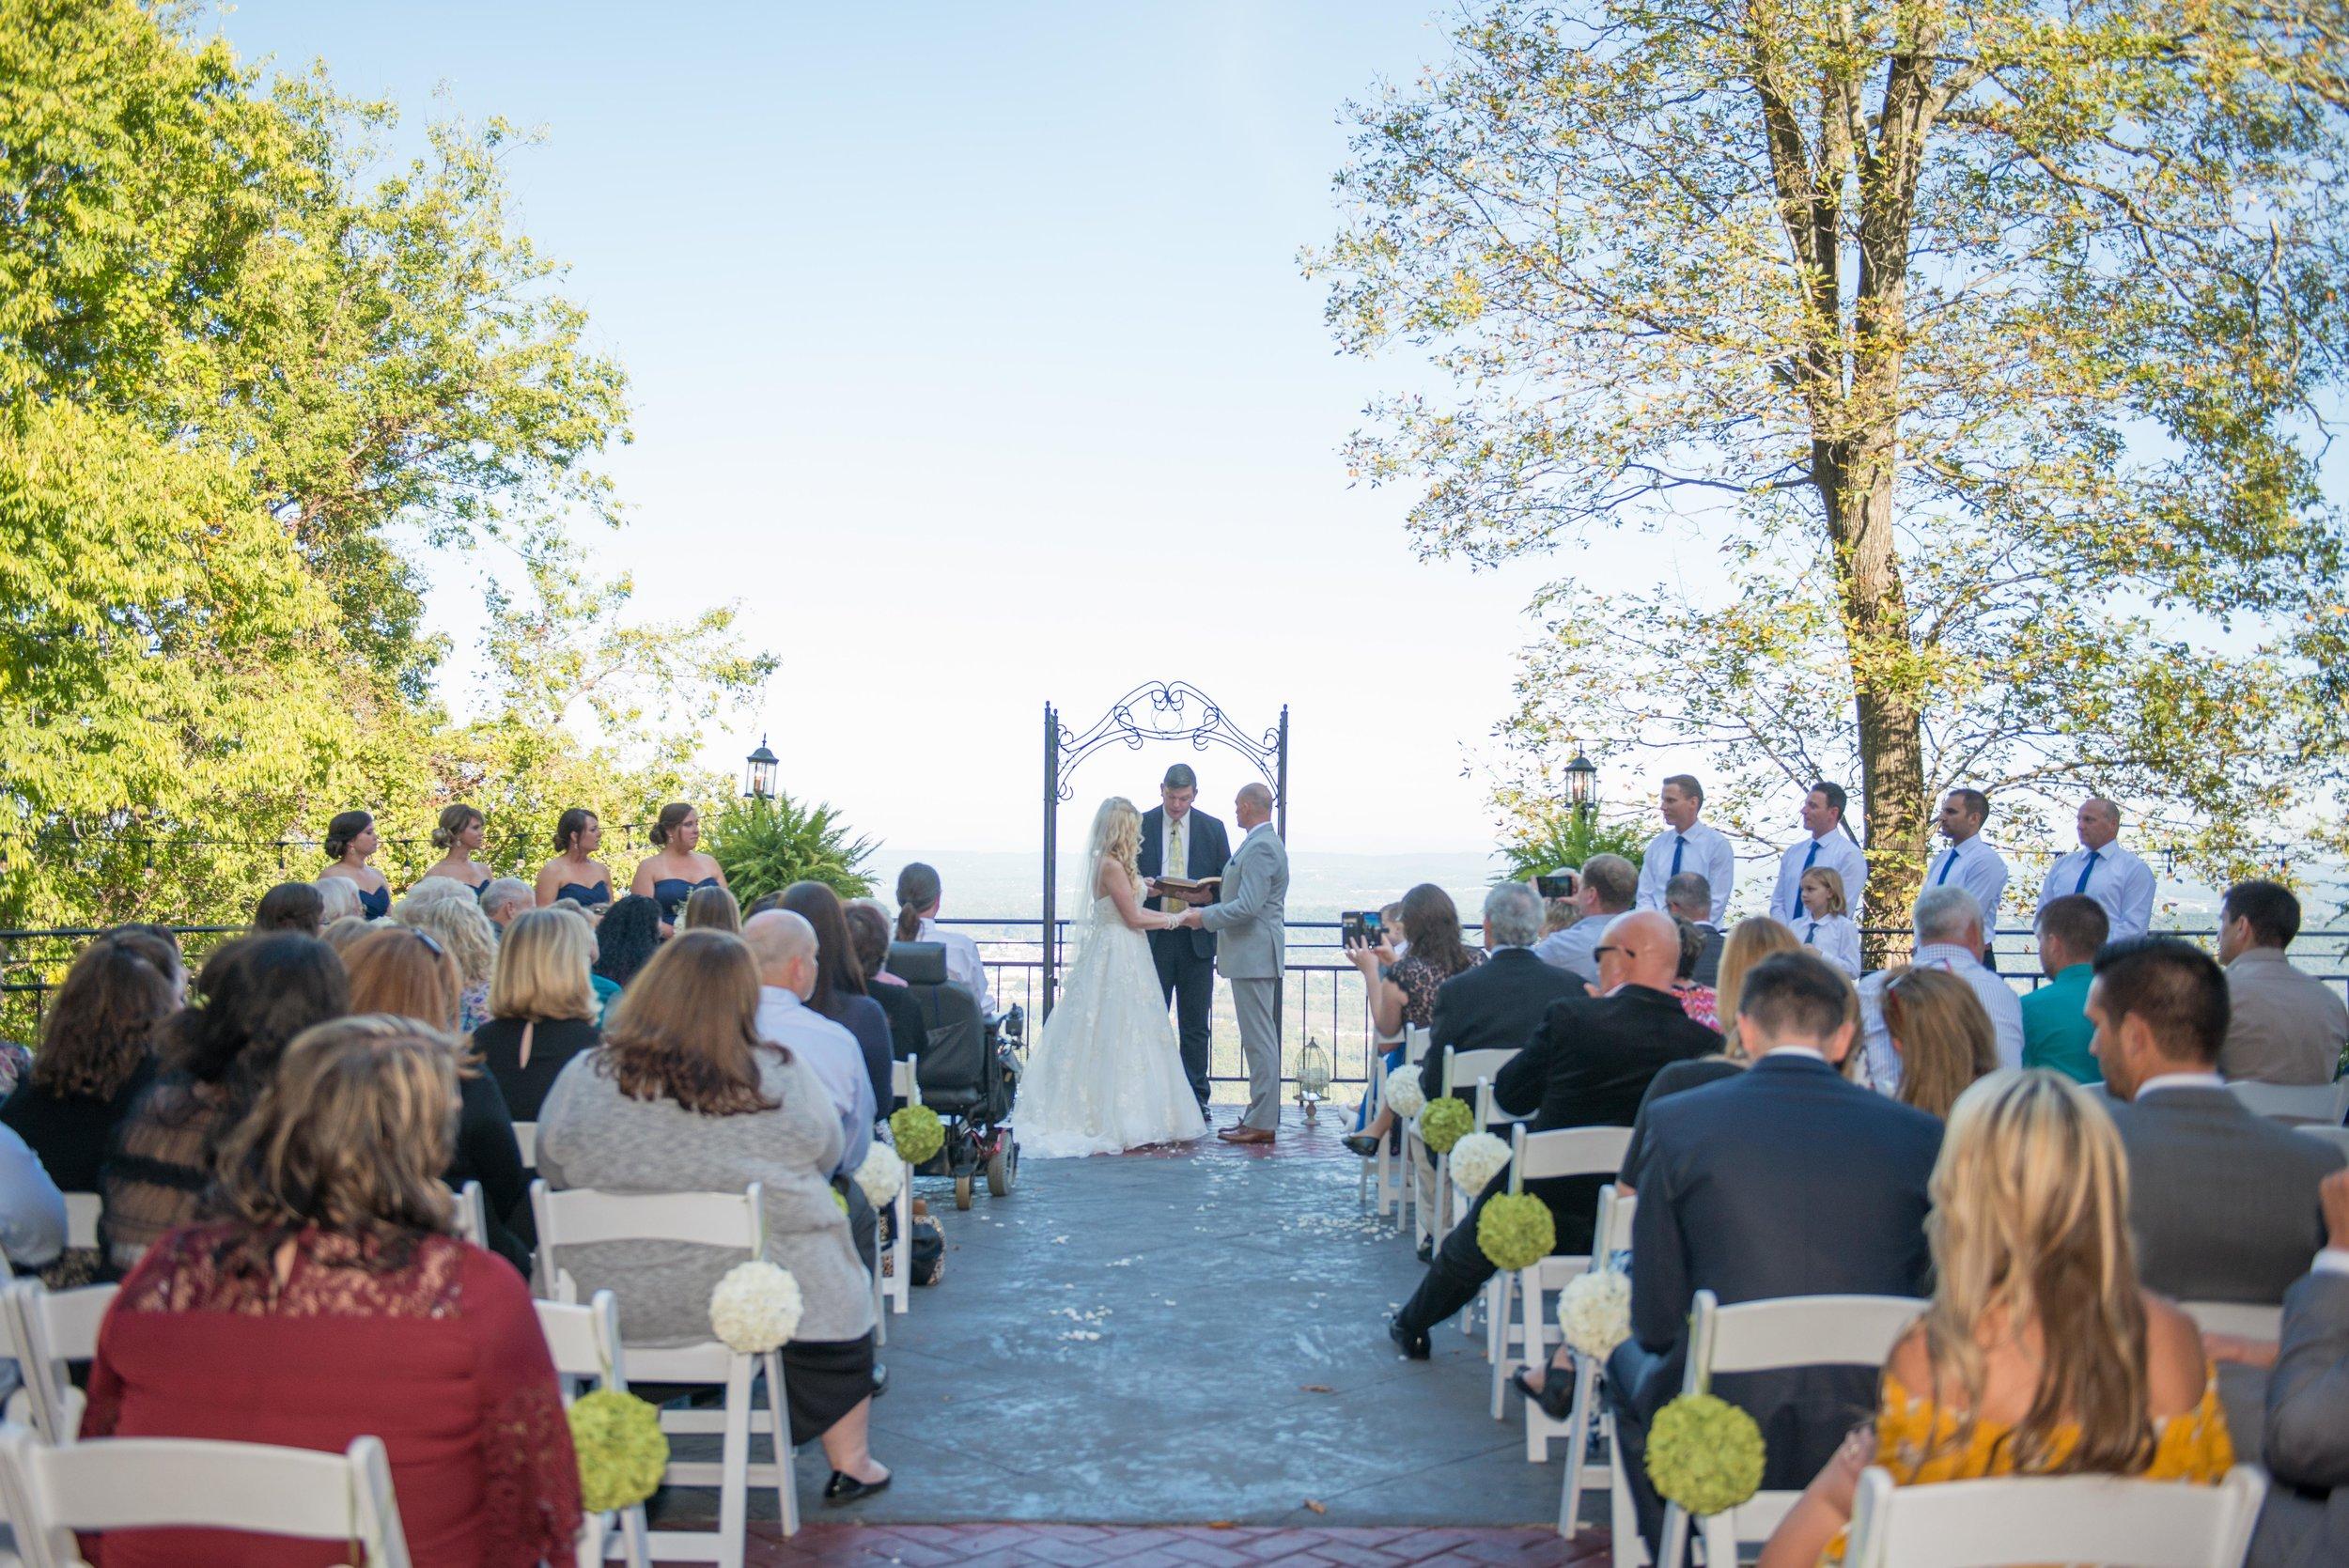 00001_Kuhnert-Wedding-44.jpg